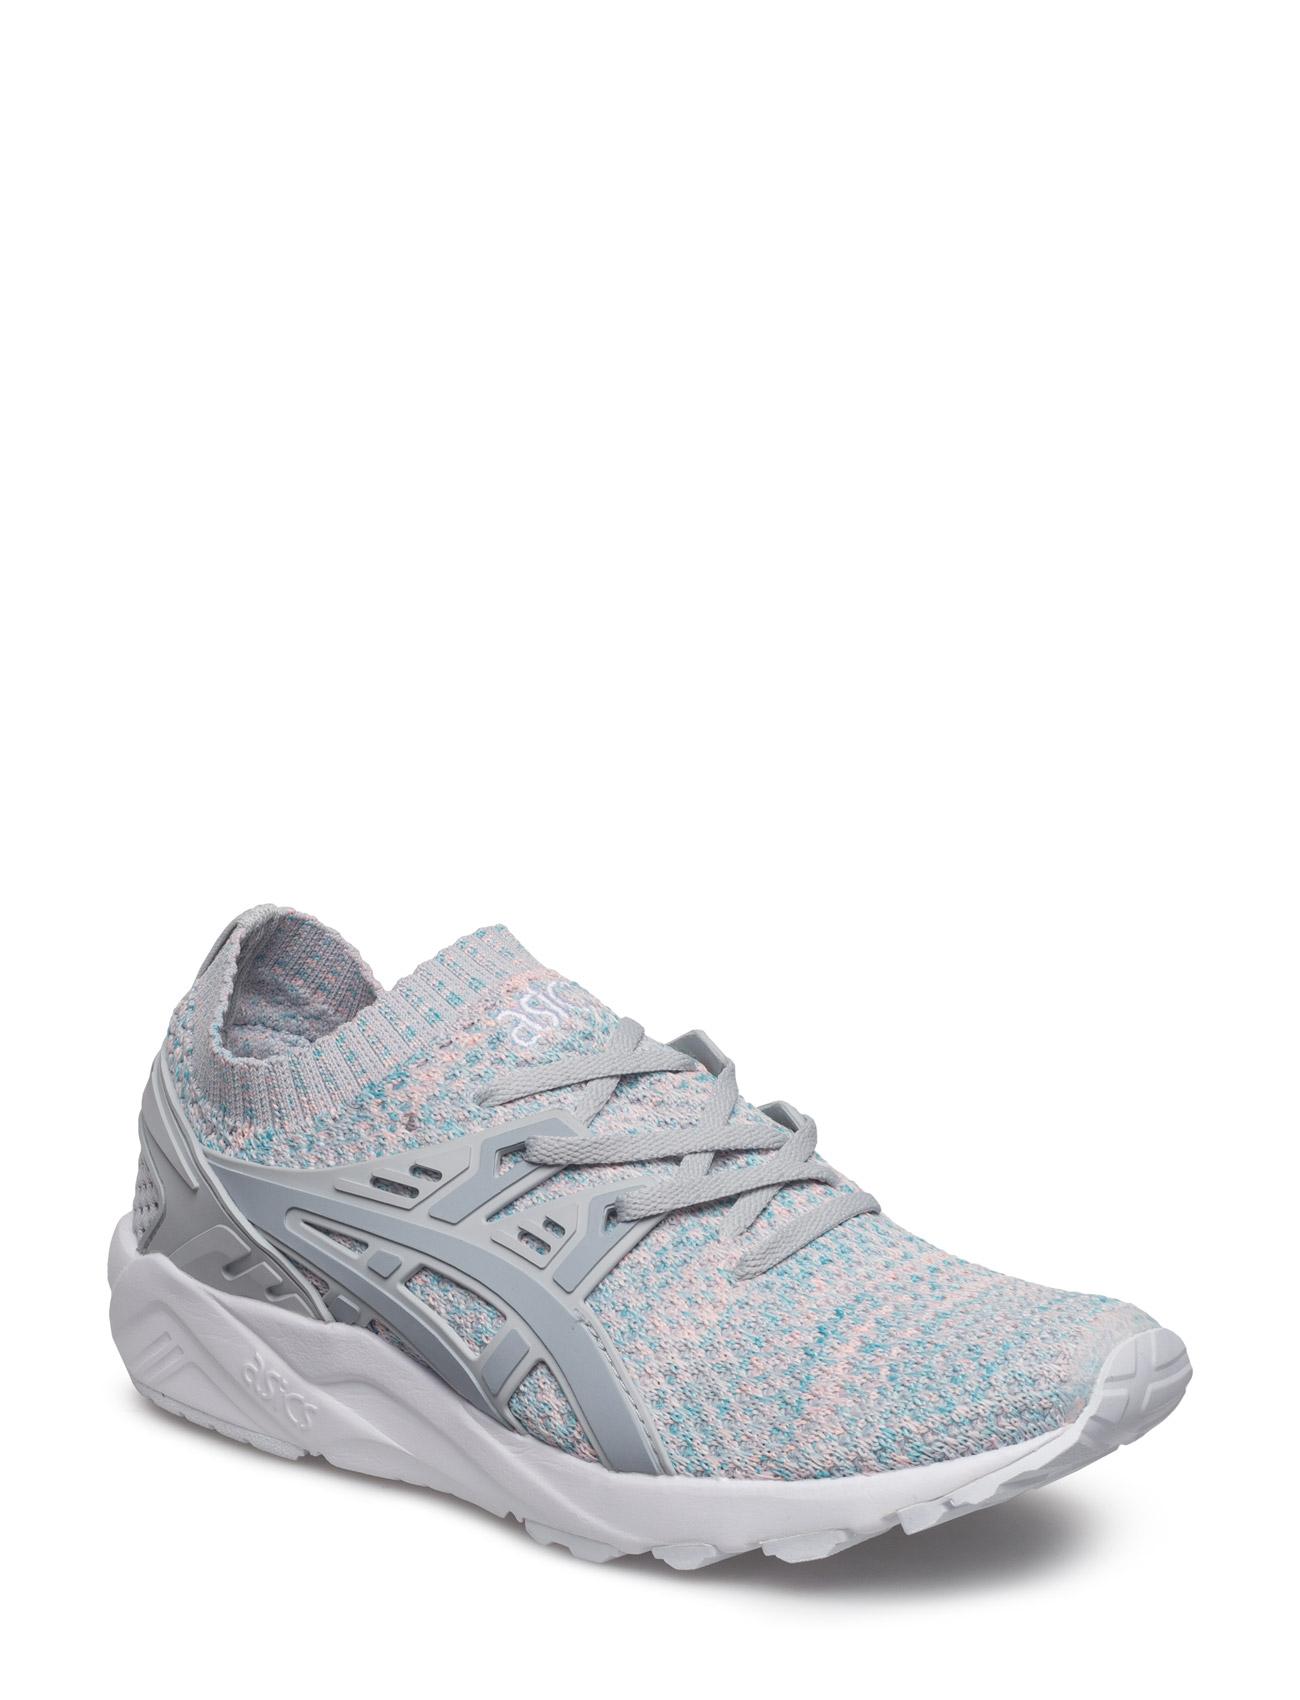 Gel-Kayano Trainer Knit Asics Sports sko til Herrer i